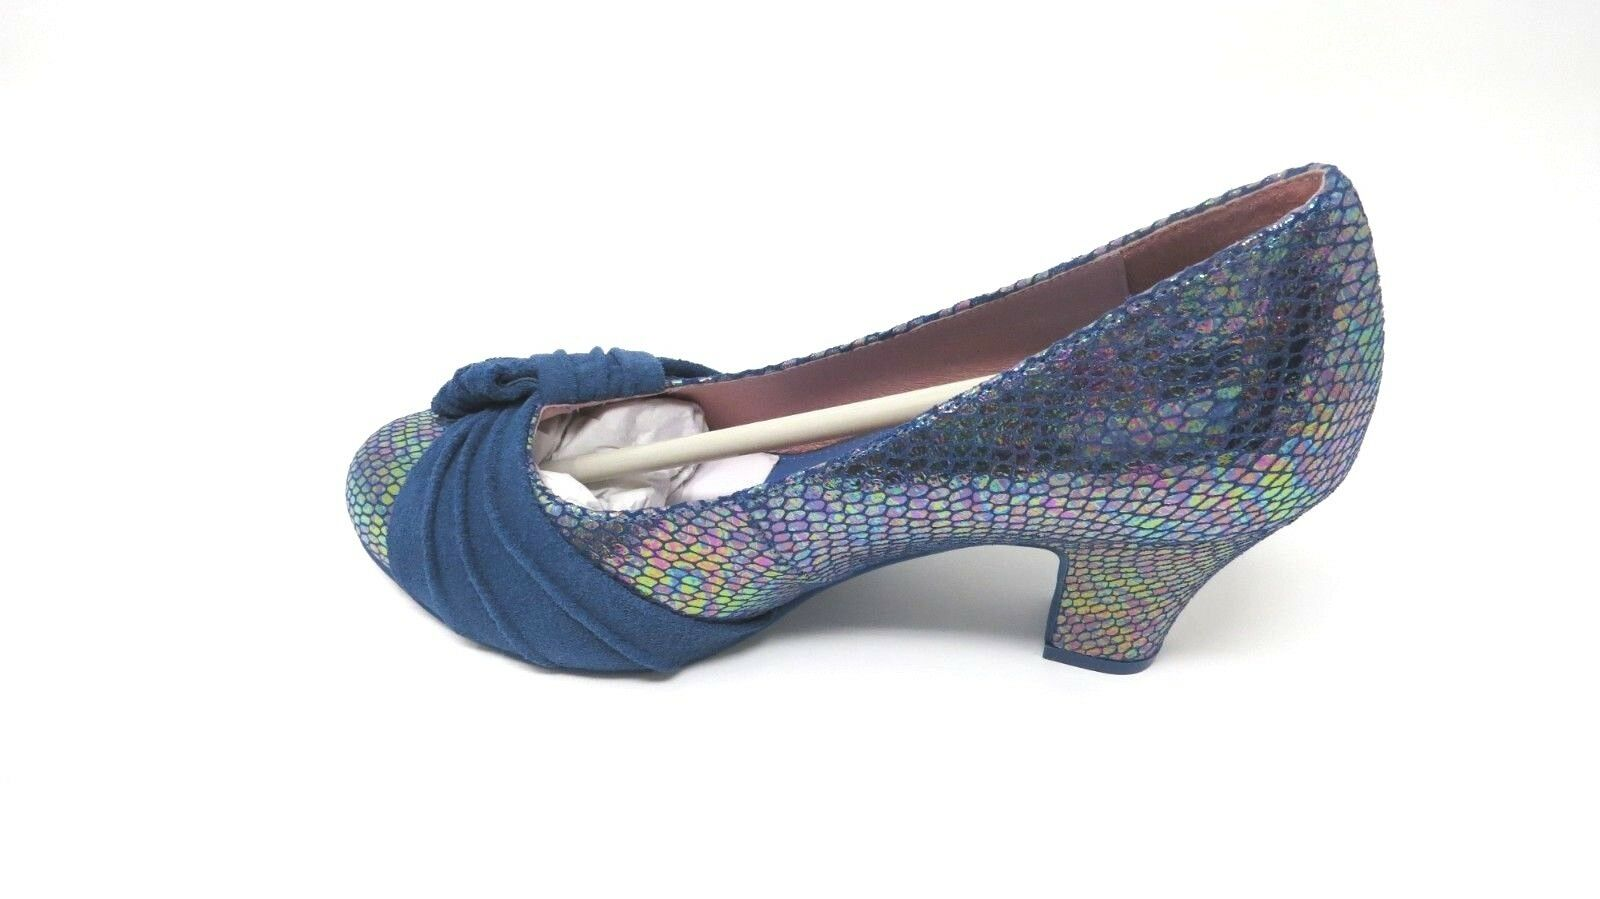 Lola Ramona Ramona blu Ava blu Ramona Lola Beat Donna Scarpe Taglia 6.5 a53c04 ... 272d3c